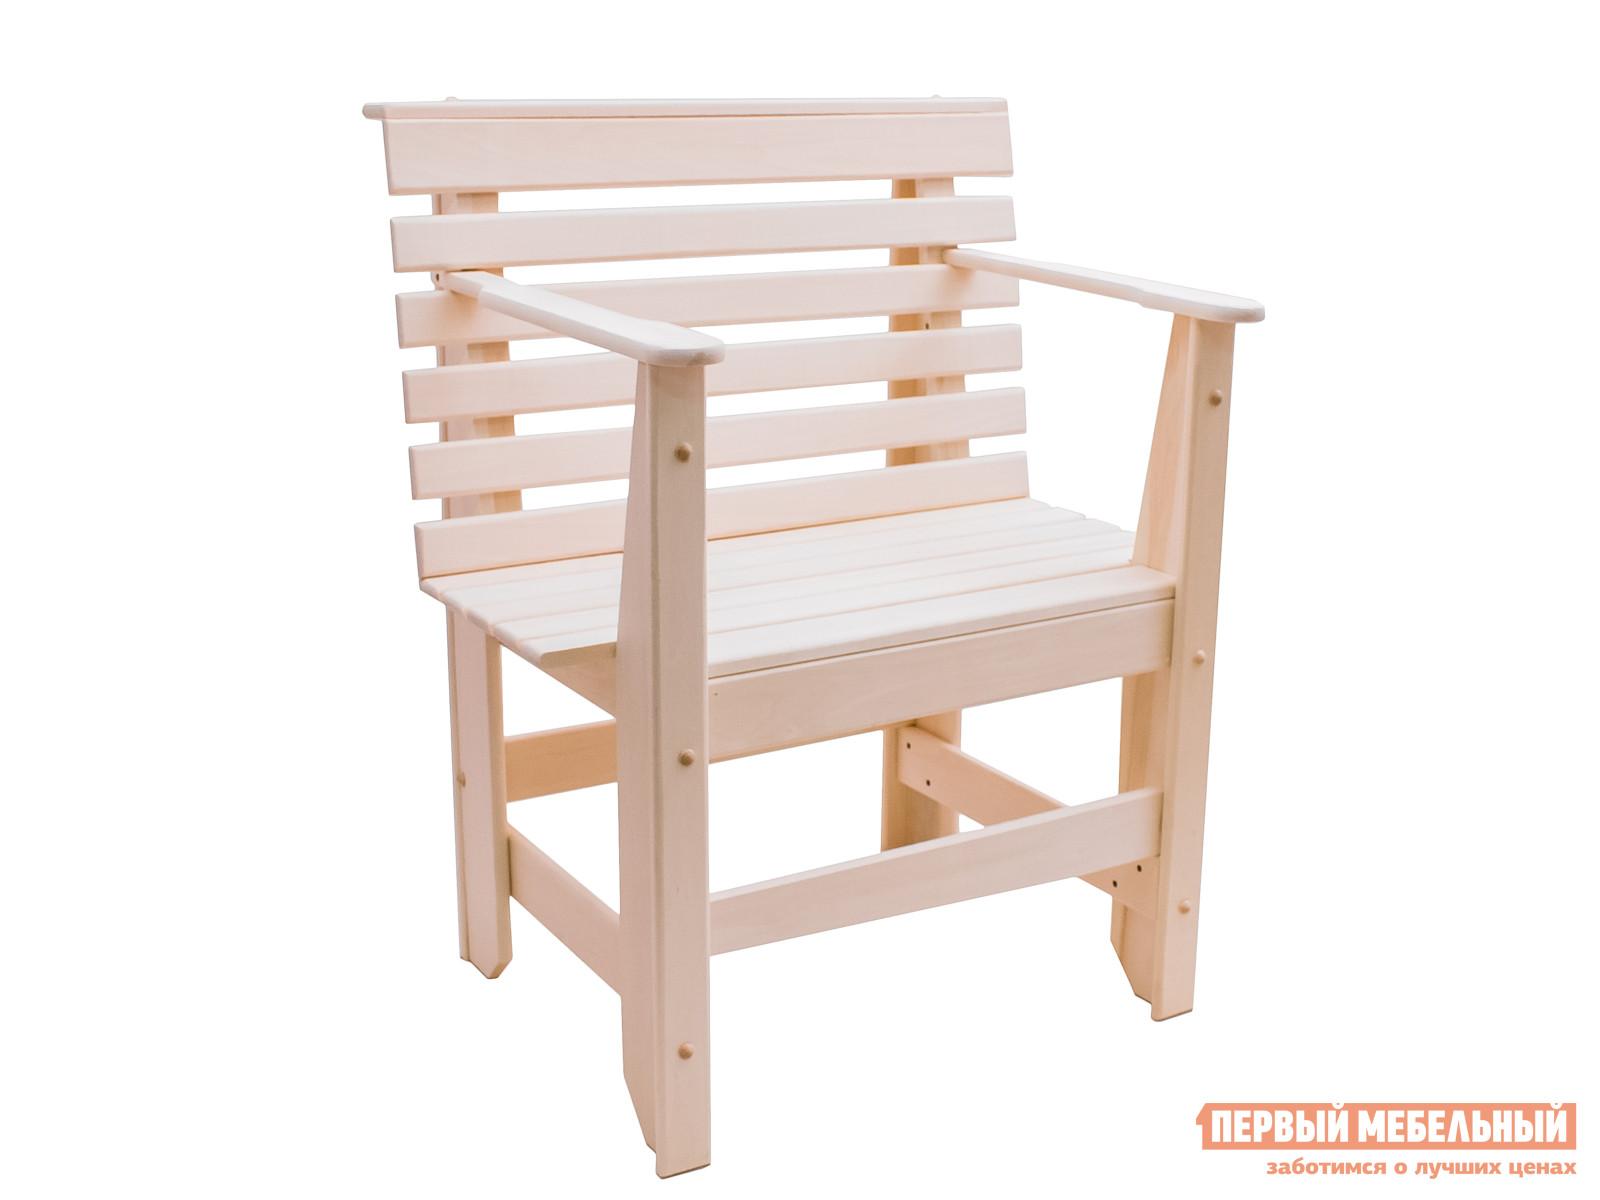 Садовое кресло ММ Нило Липа от Купистол